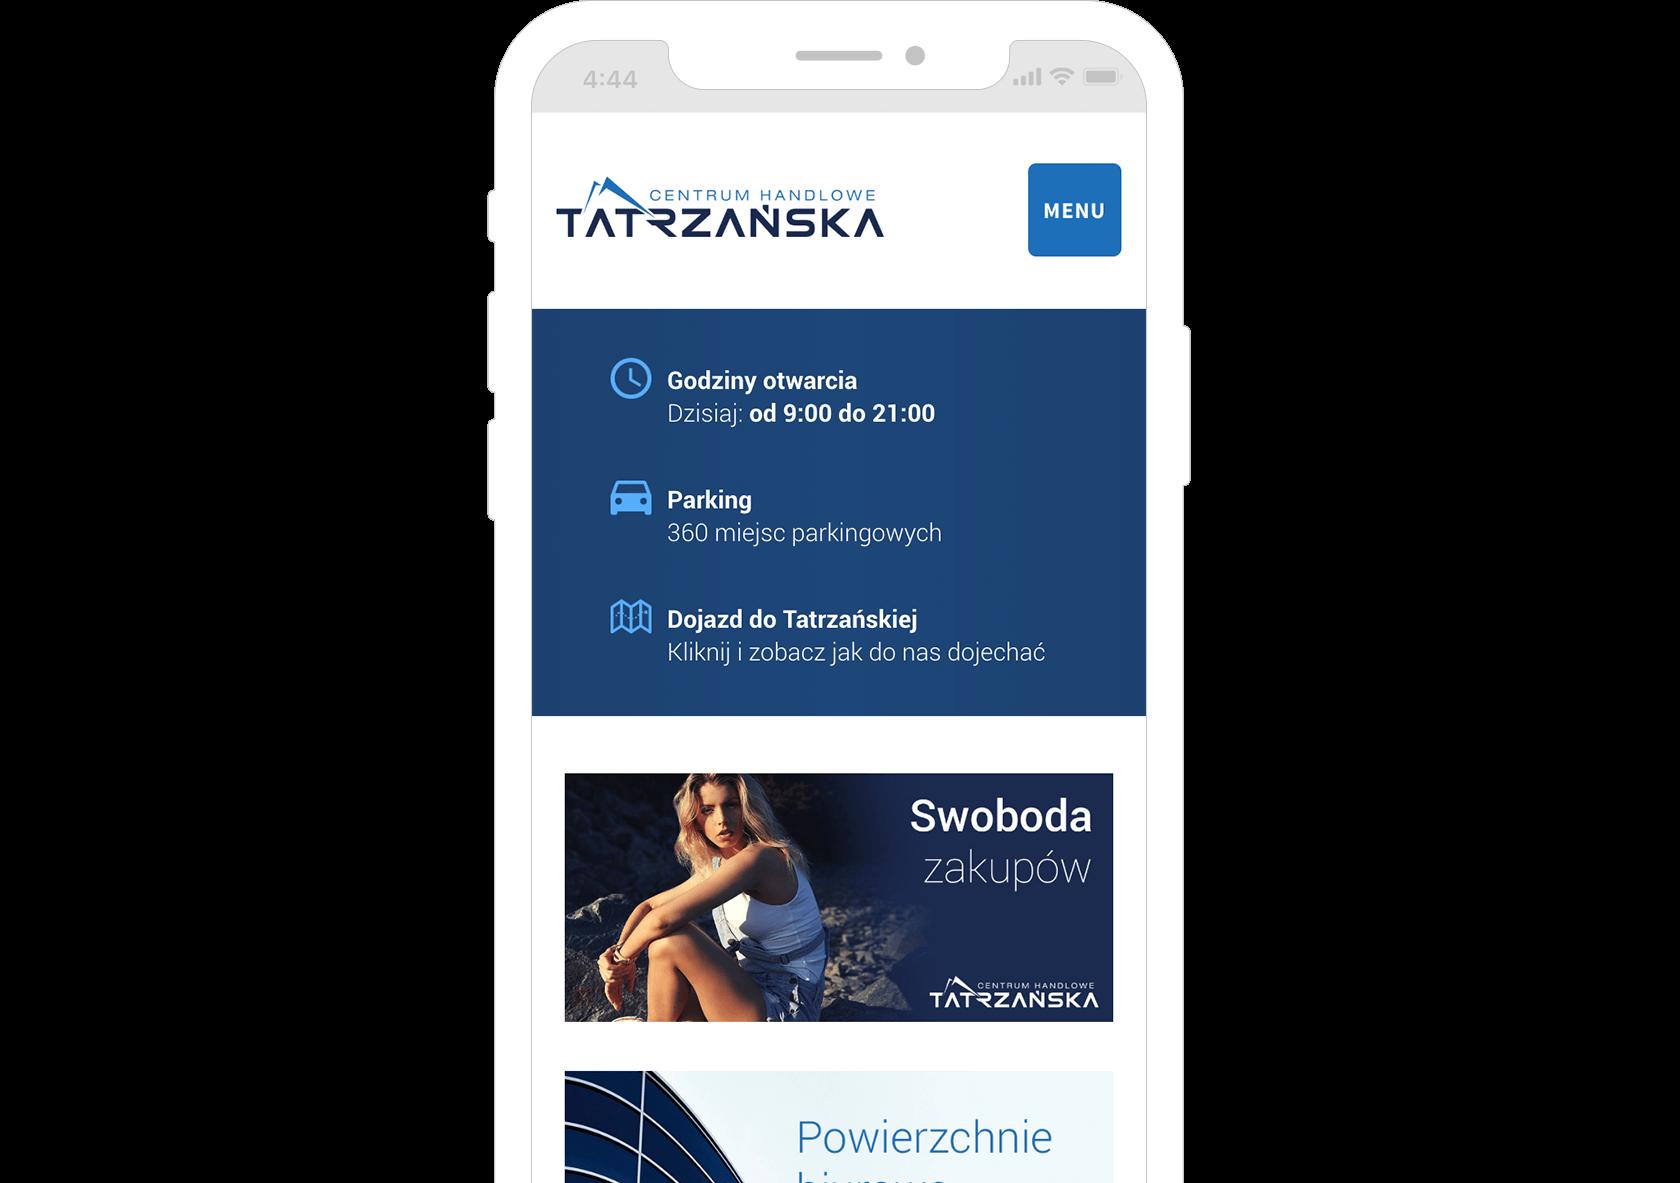 CH Tatrzańska